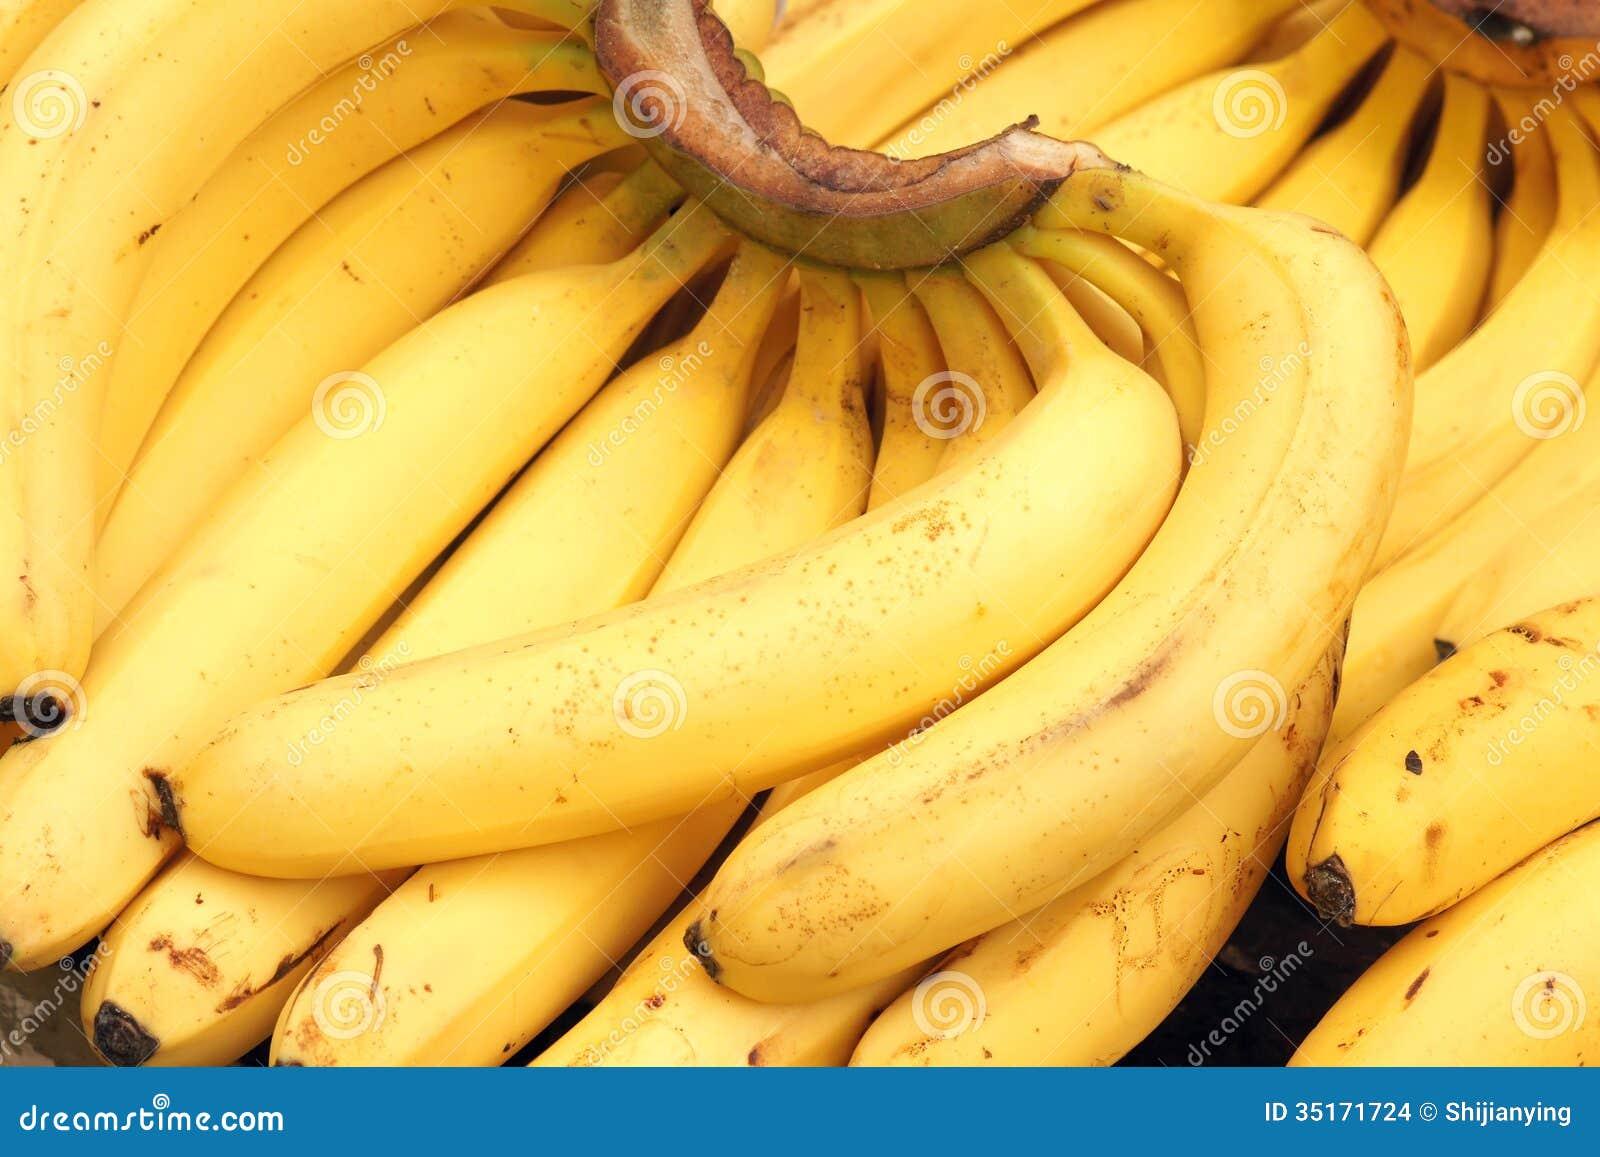 Selling banana